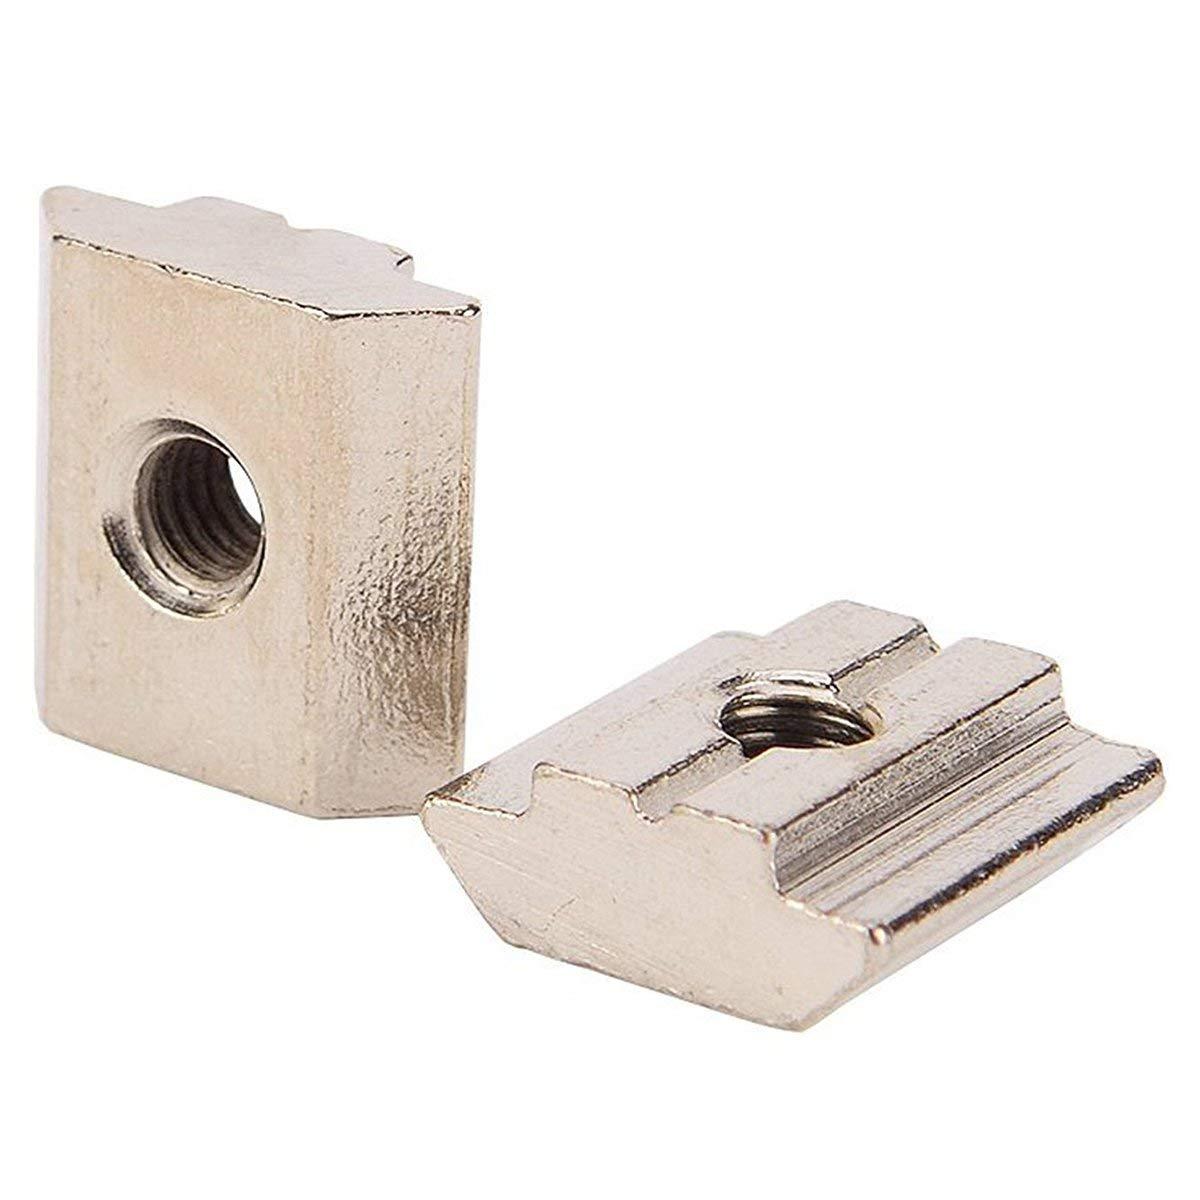 12-Pack The Hillman Group 44760 M6 x 11 x 19 Metric Tee Nut Brad Hole